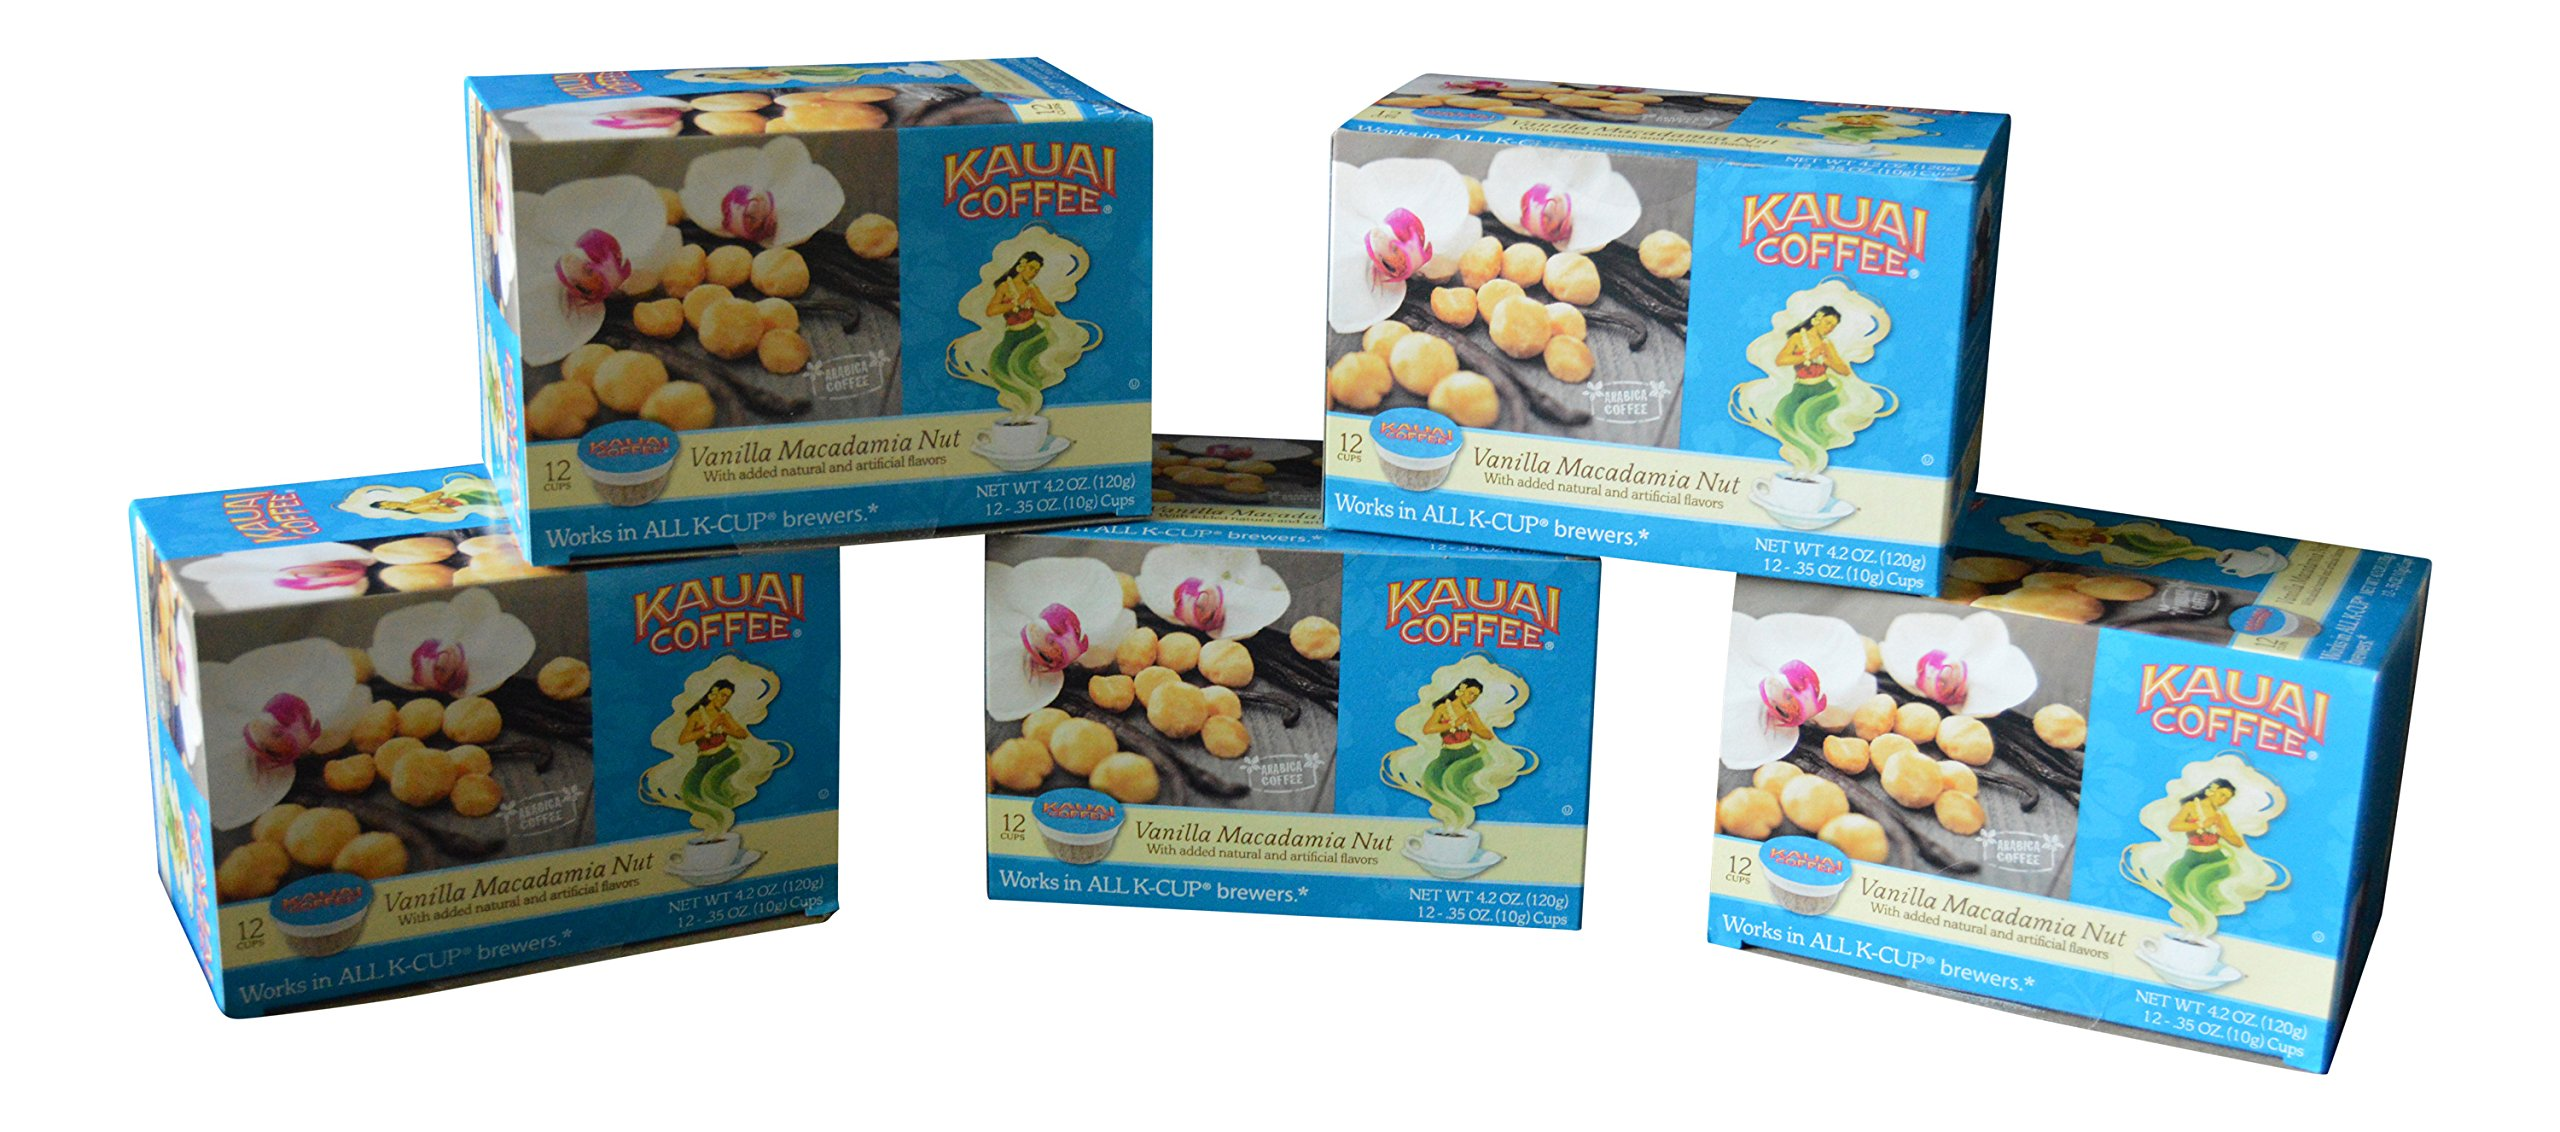 Kauai Coffee, Vanilla Macadamia Nut (Pack of 5)